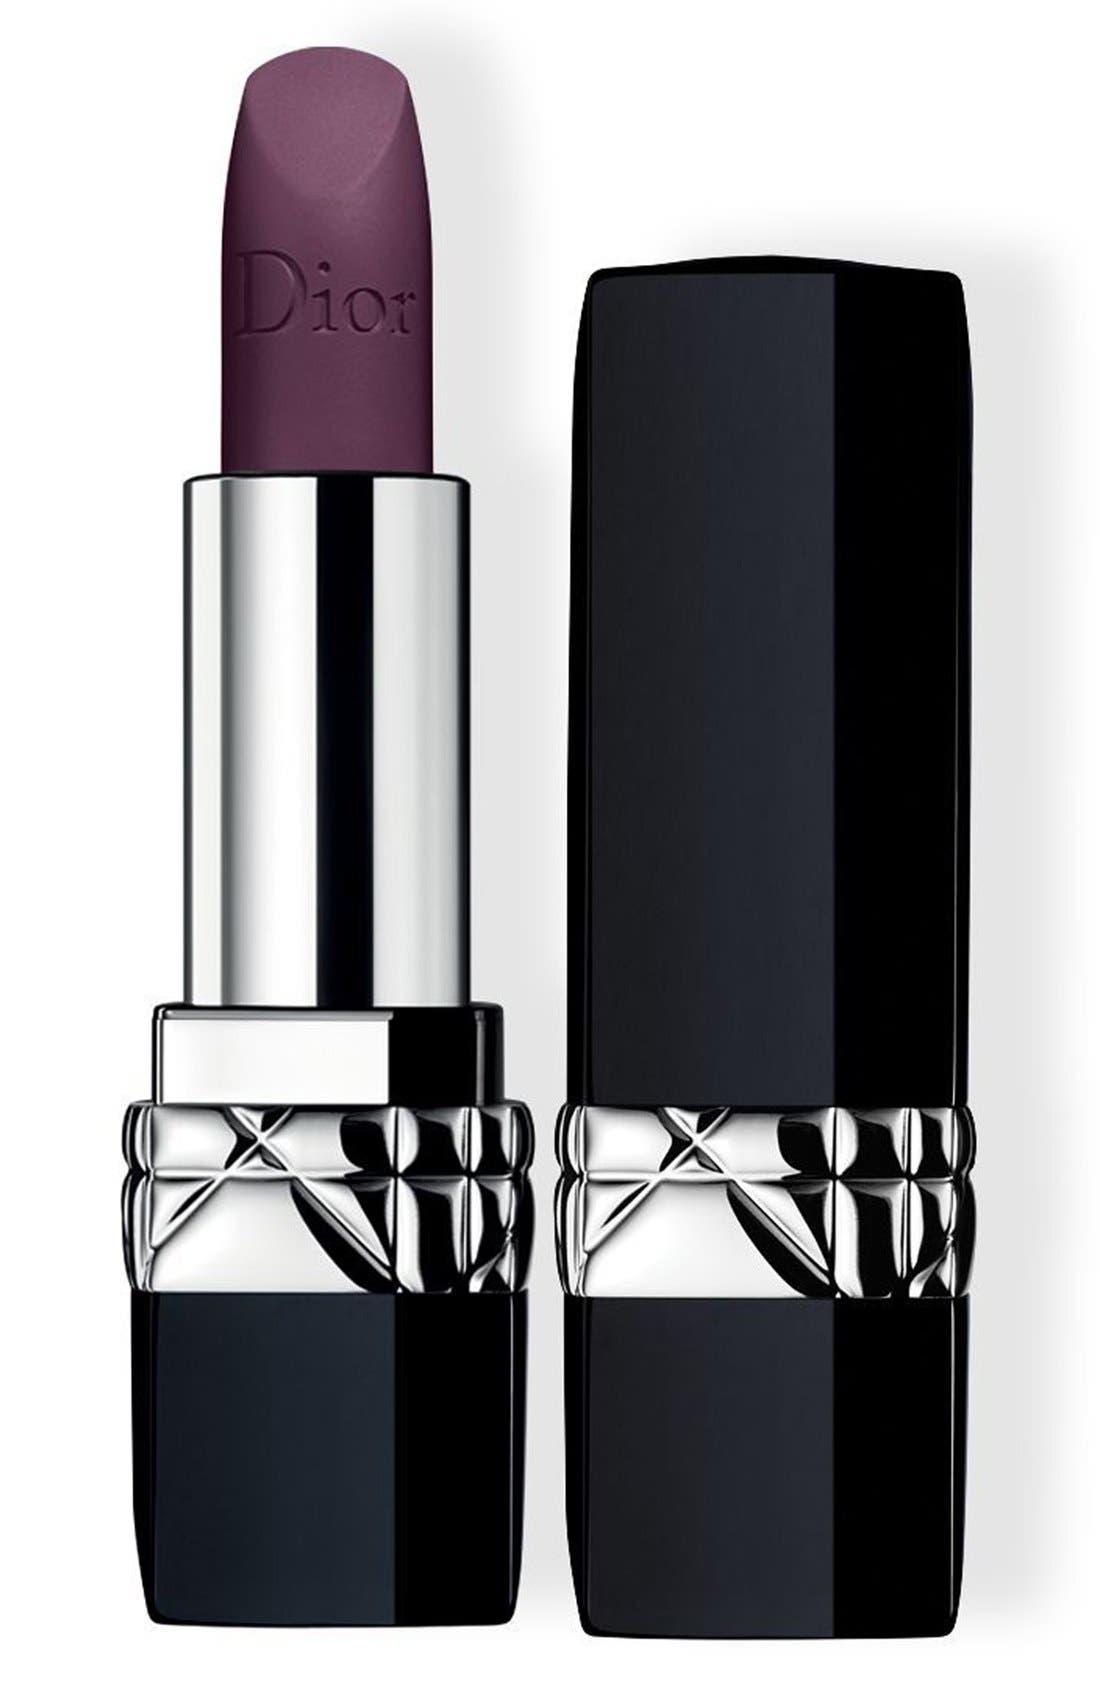 Dior Couture Color Rouge Dior Lipstick - 962 Poison Matte